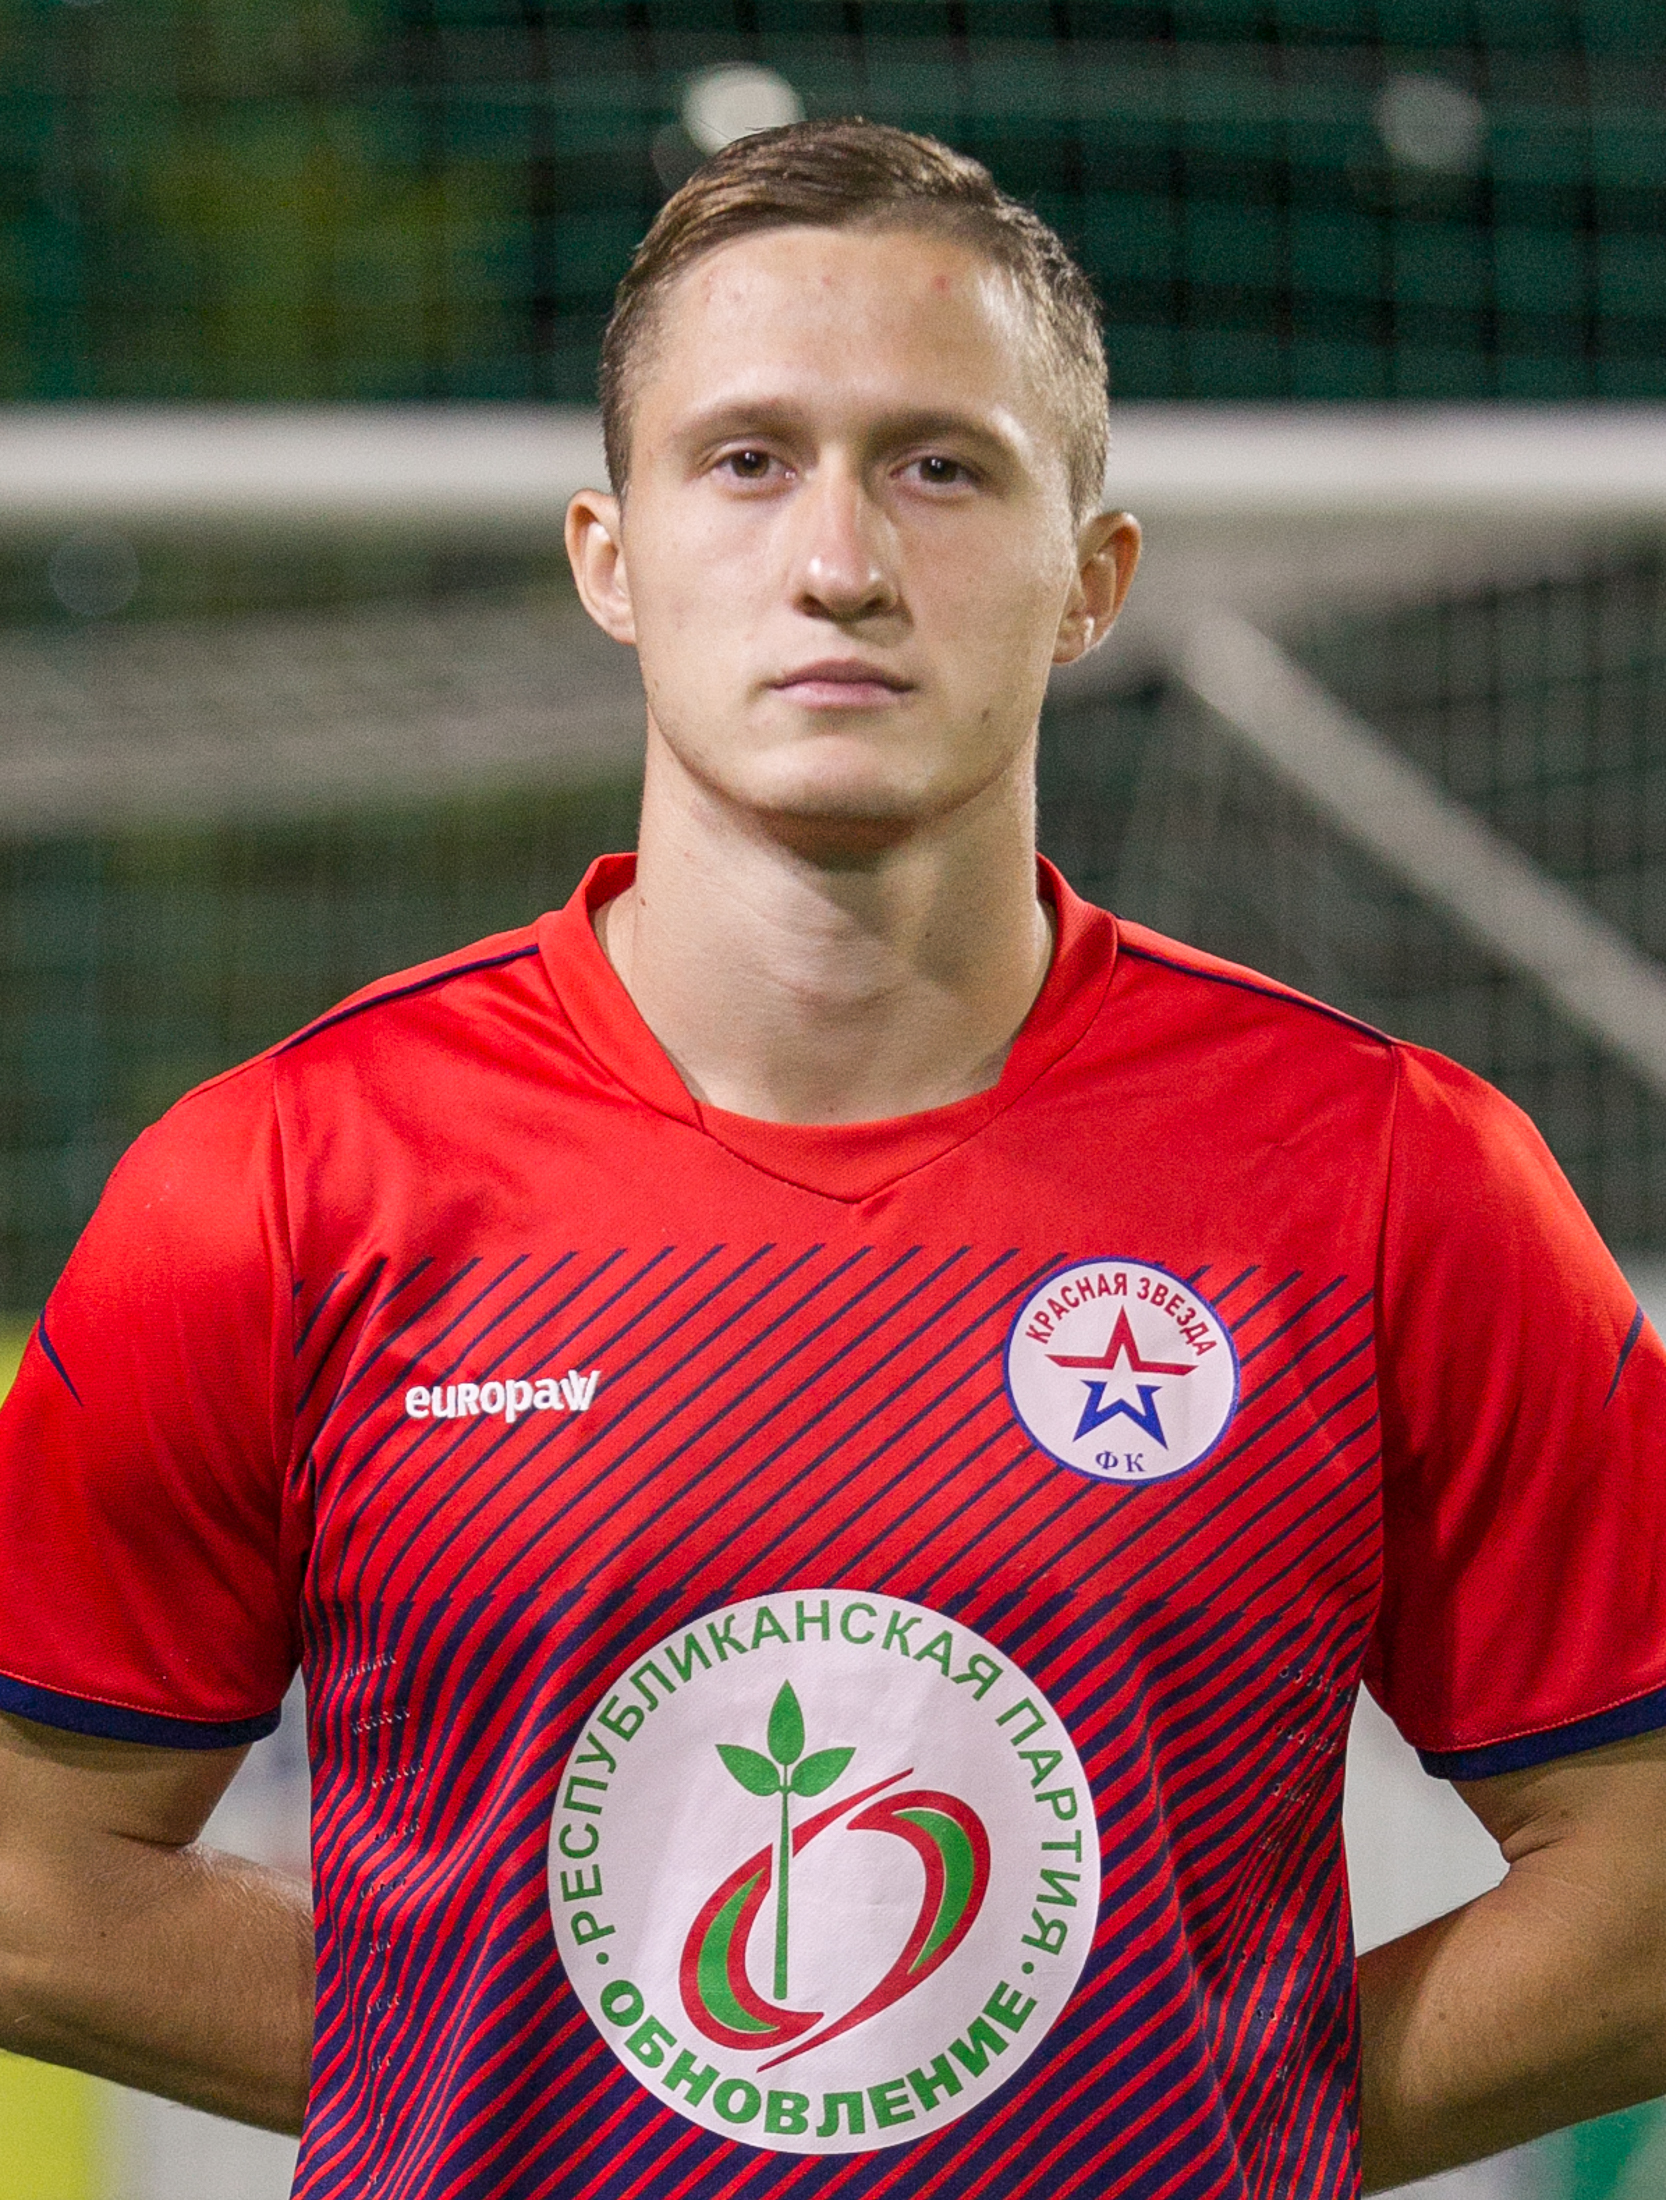 Шевченко Михаил